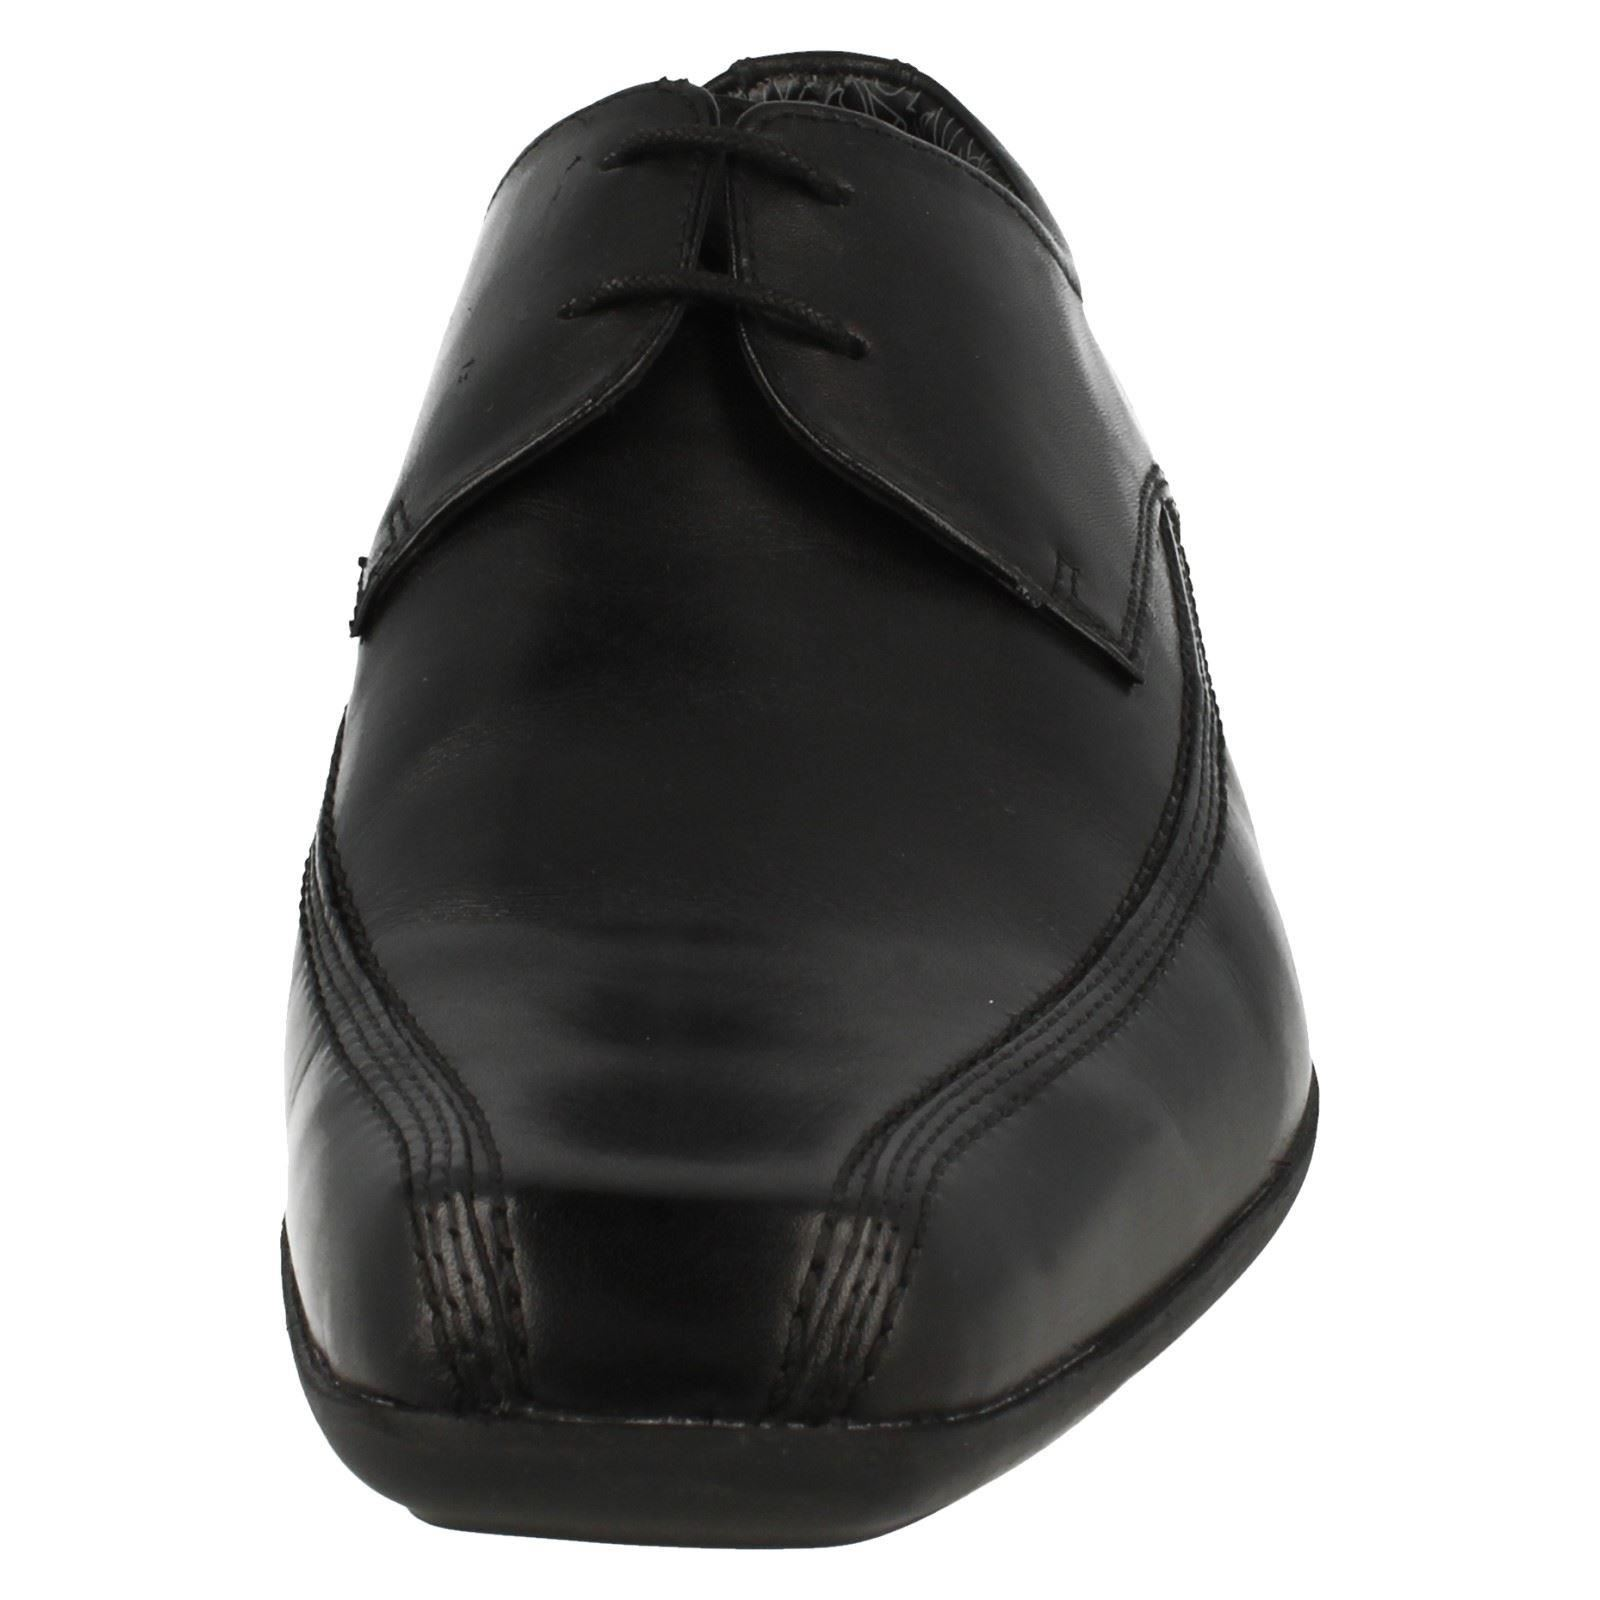 Up  Herren Clarks Lace Up  Leder Formal Schuhes Aze Day 7b84c5